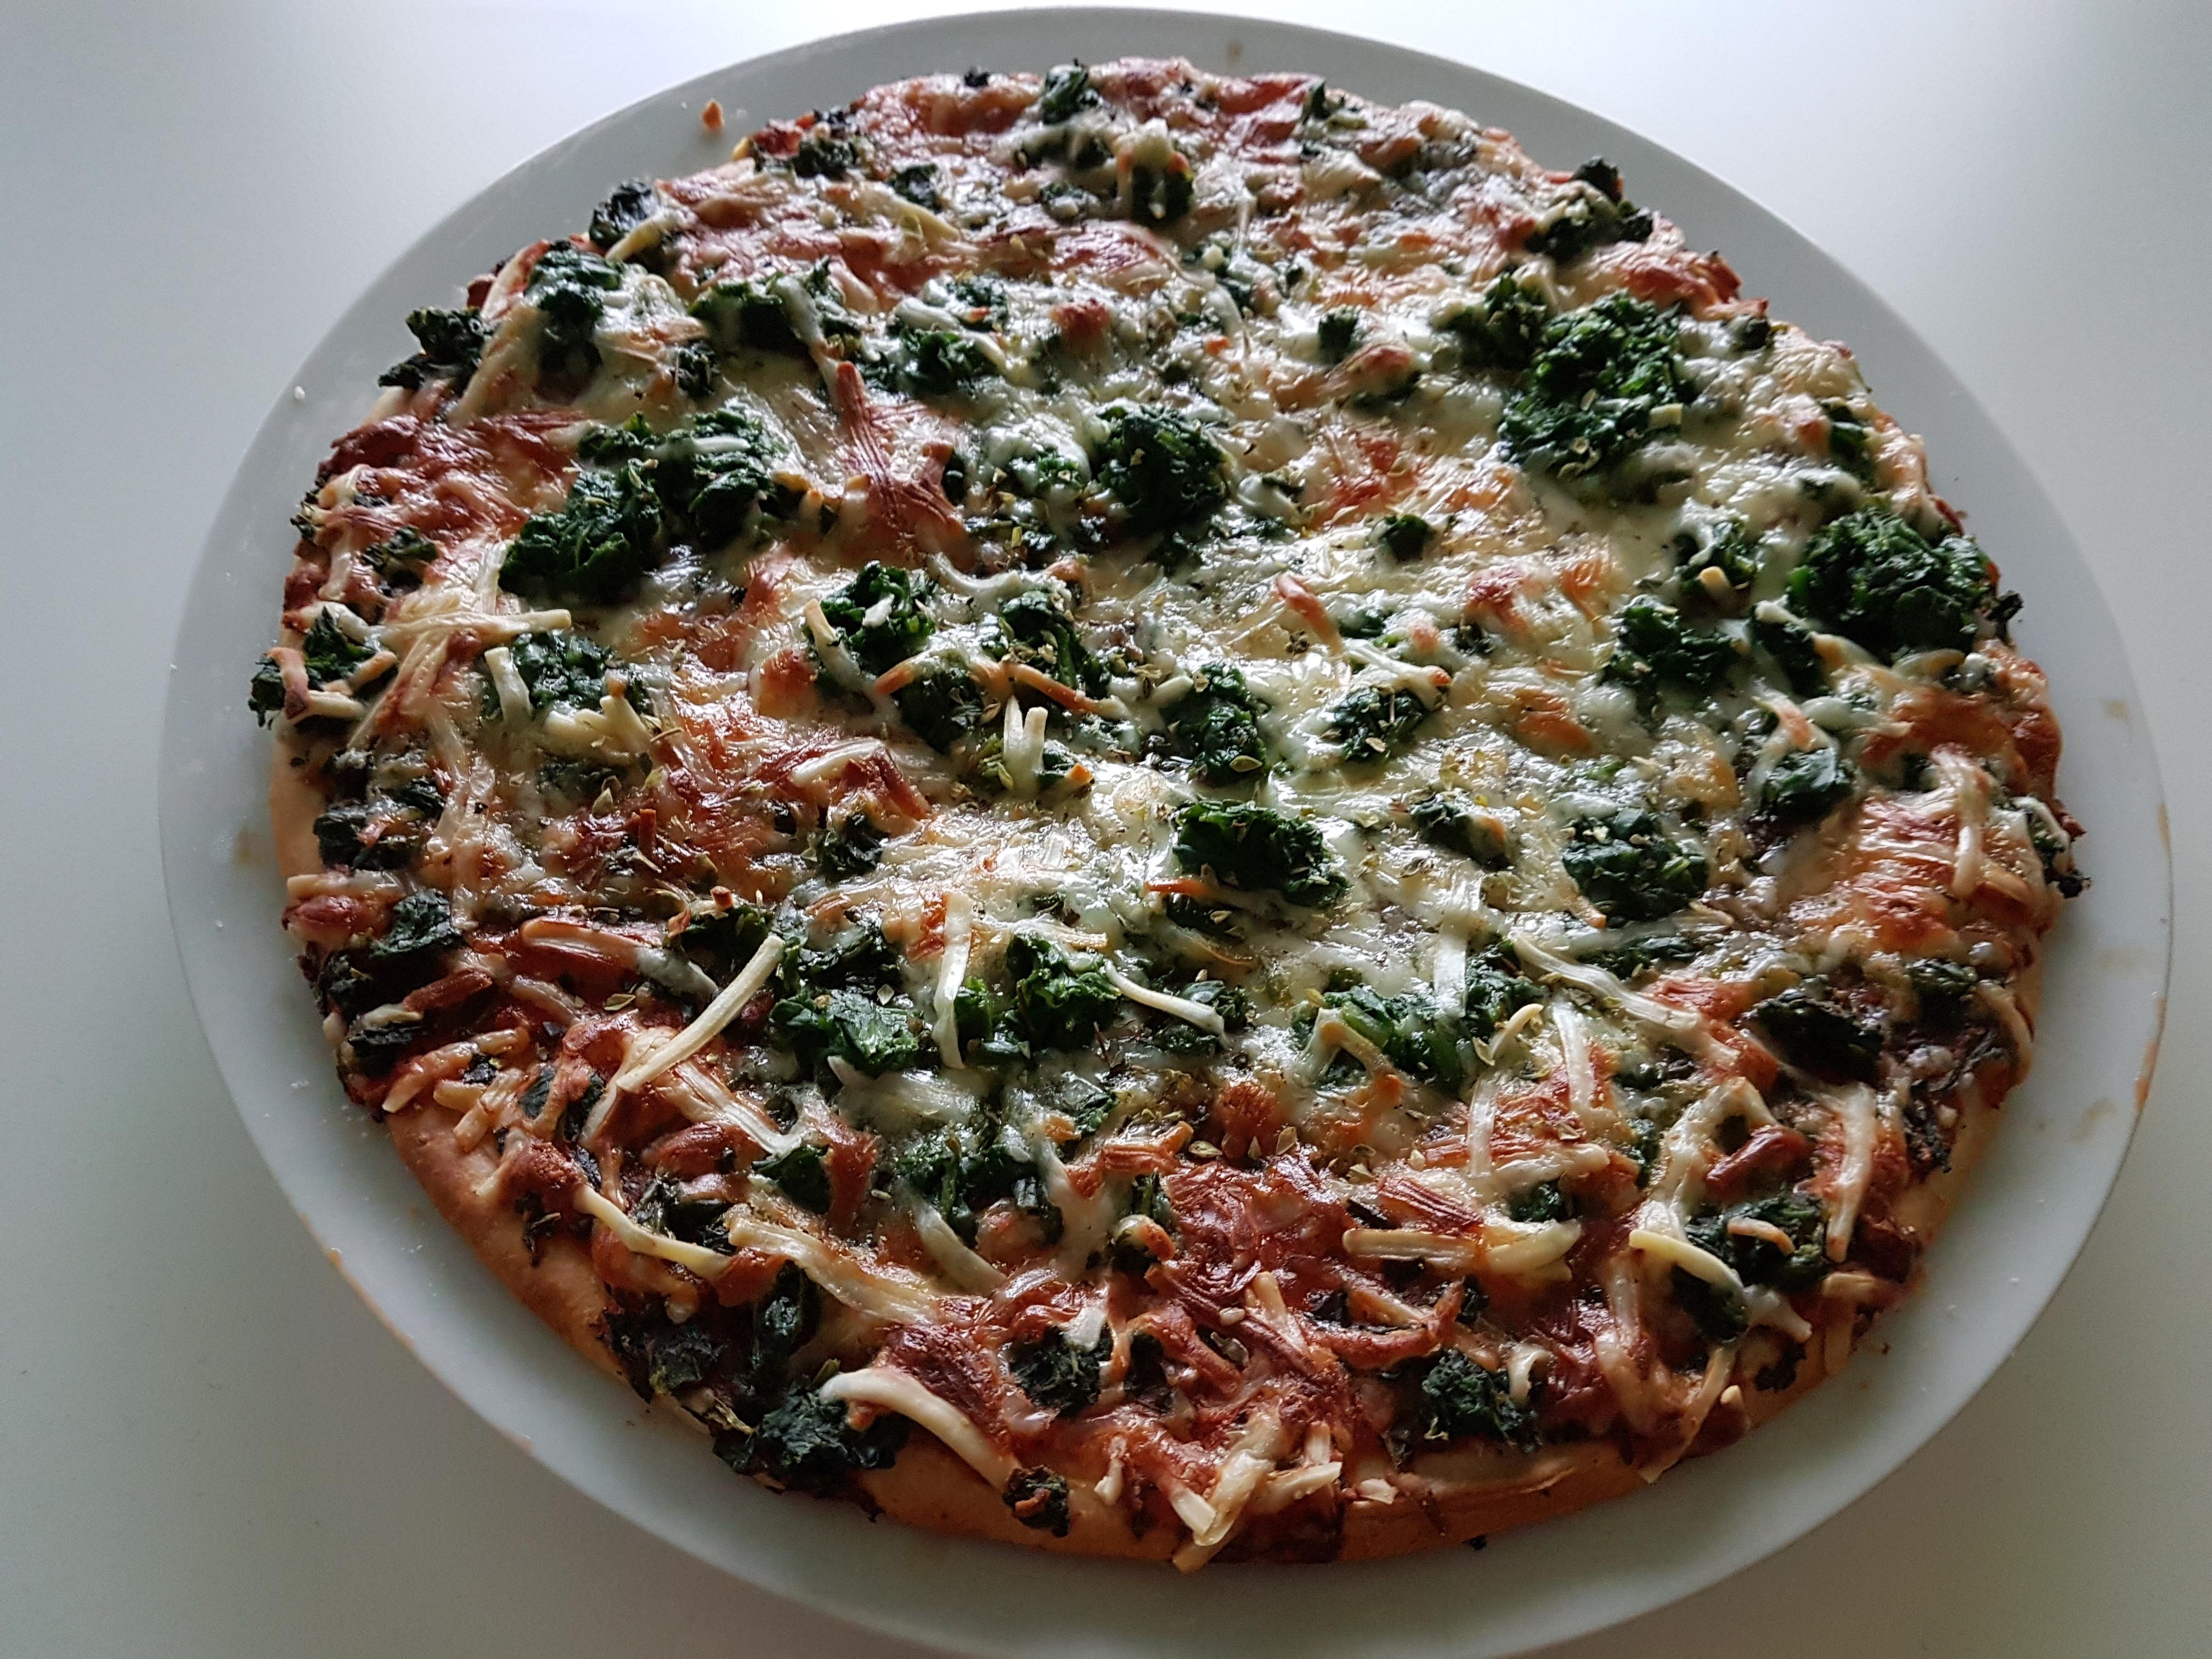 http://foodloader.net/Holz_2017-07-05_Pizza.jpg